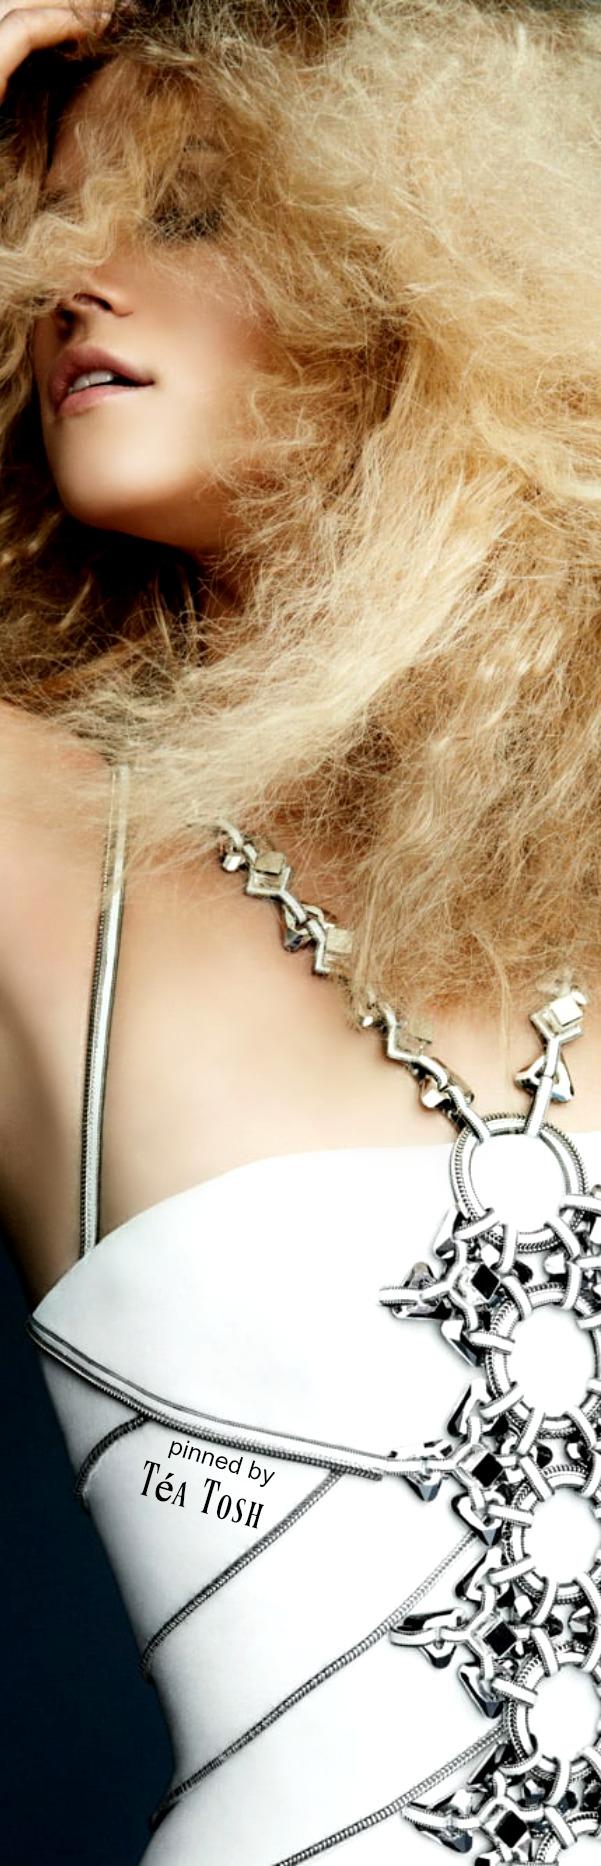 ❇︎Téa Tosh❇︎Atelier Versace, Spring 2010